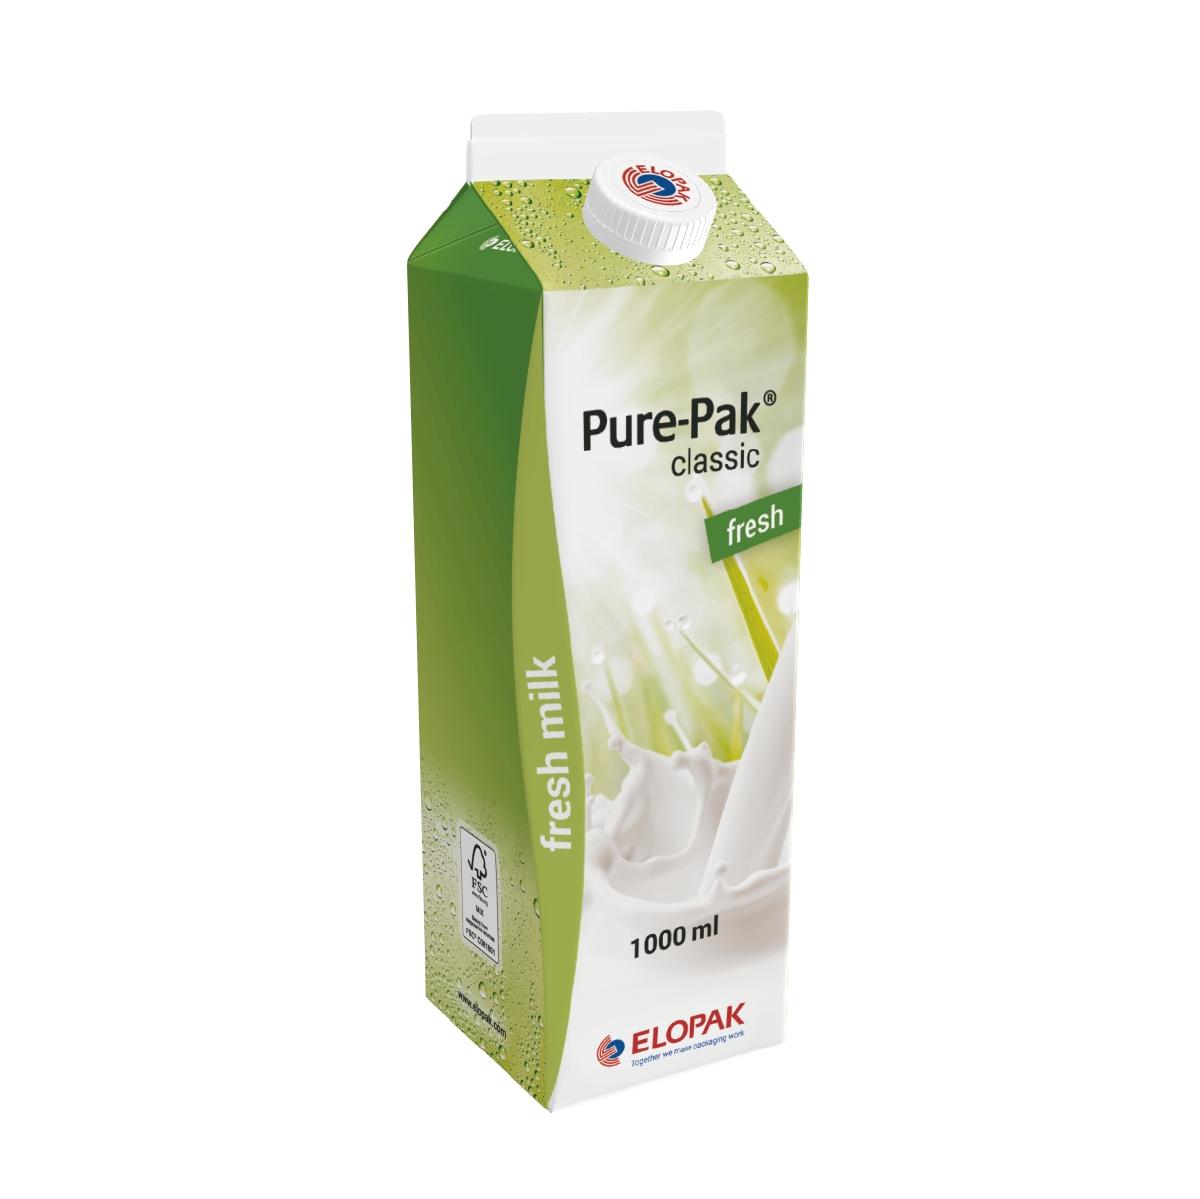 Pure-Pak Classic. Photo: Elopak